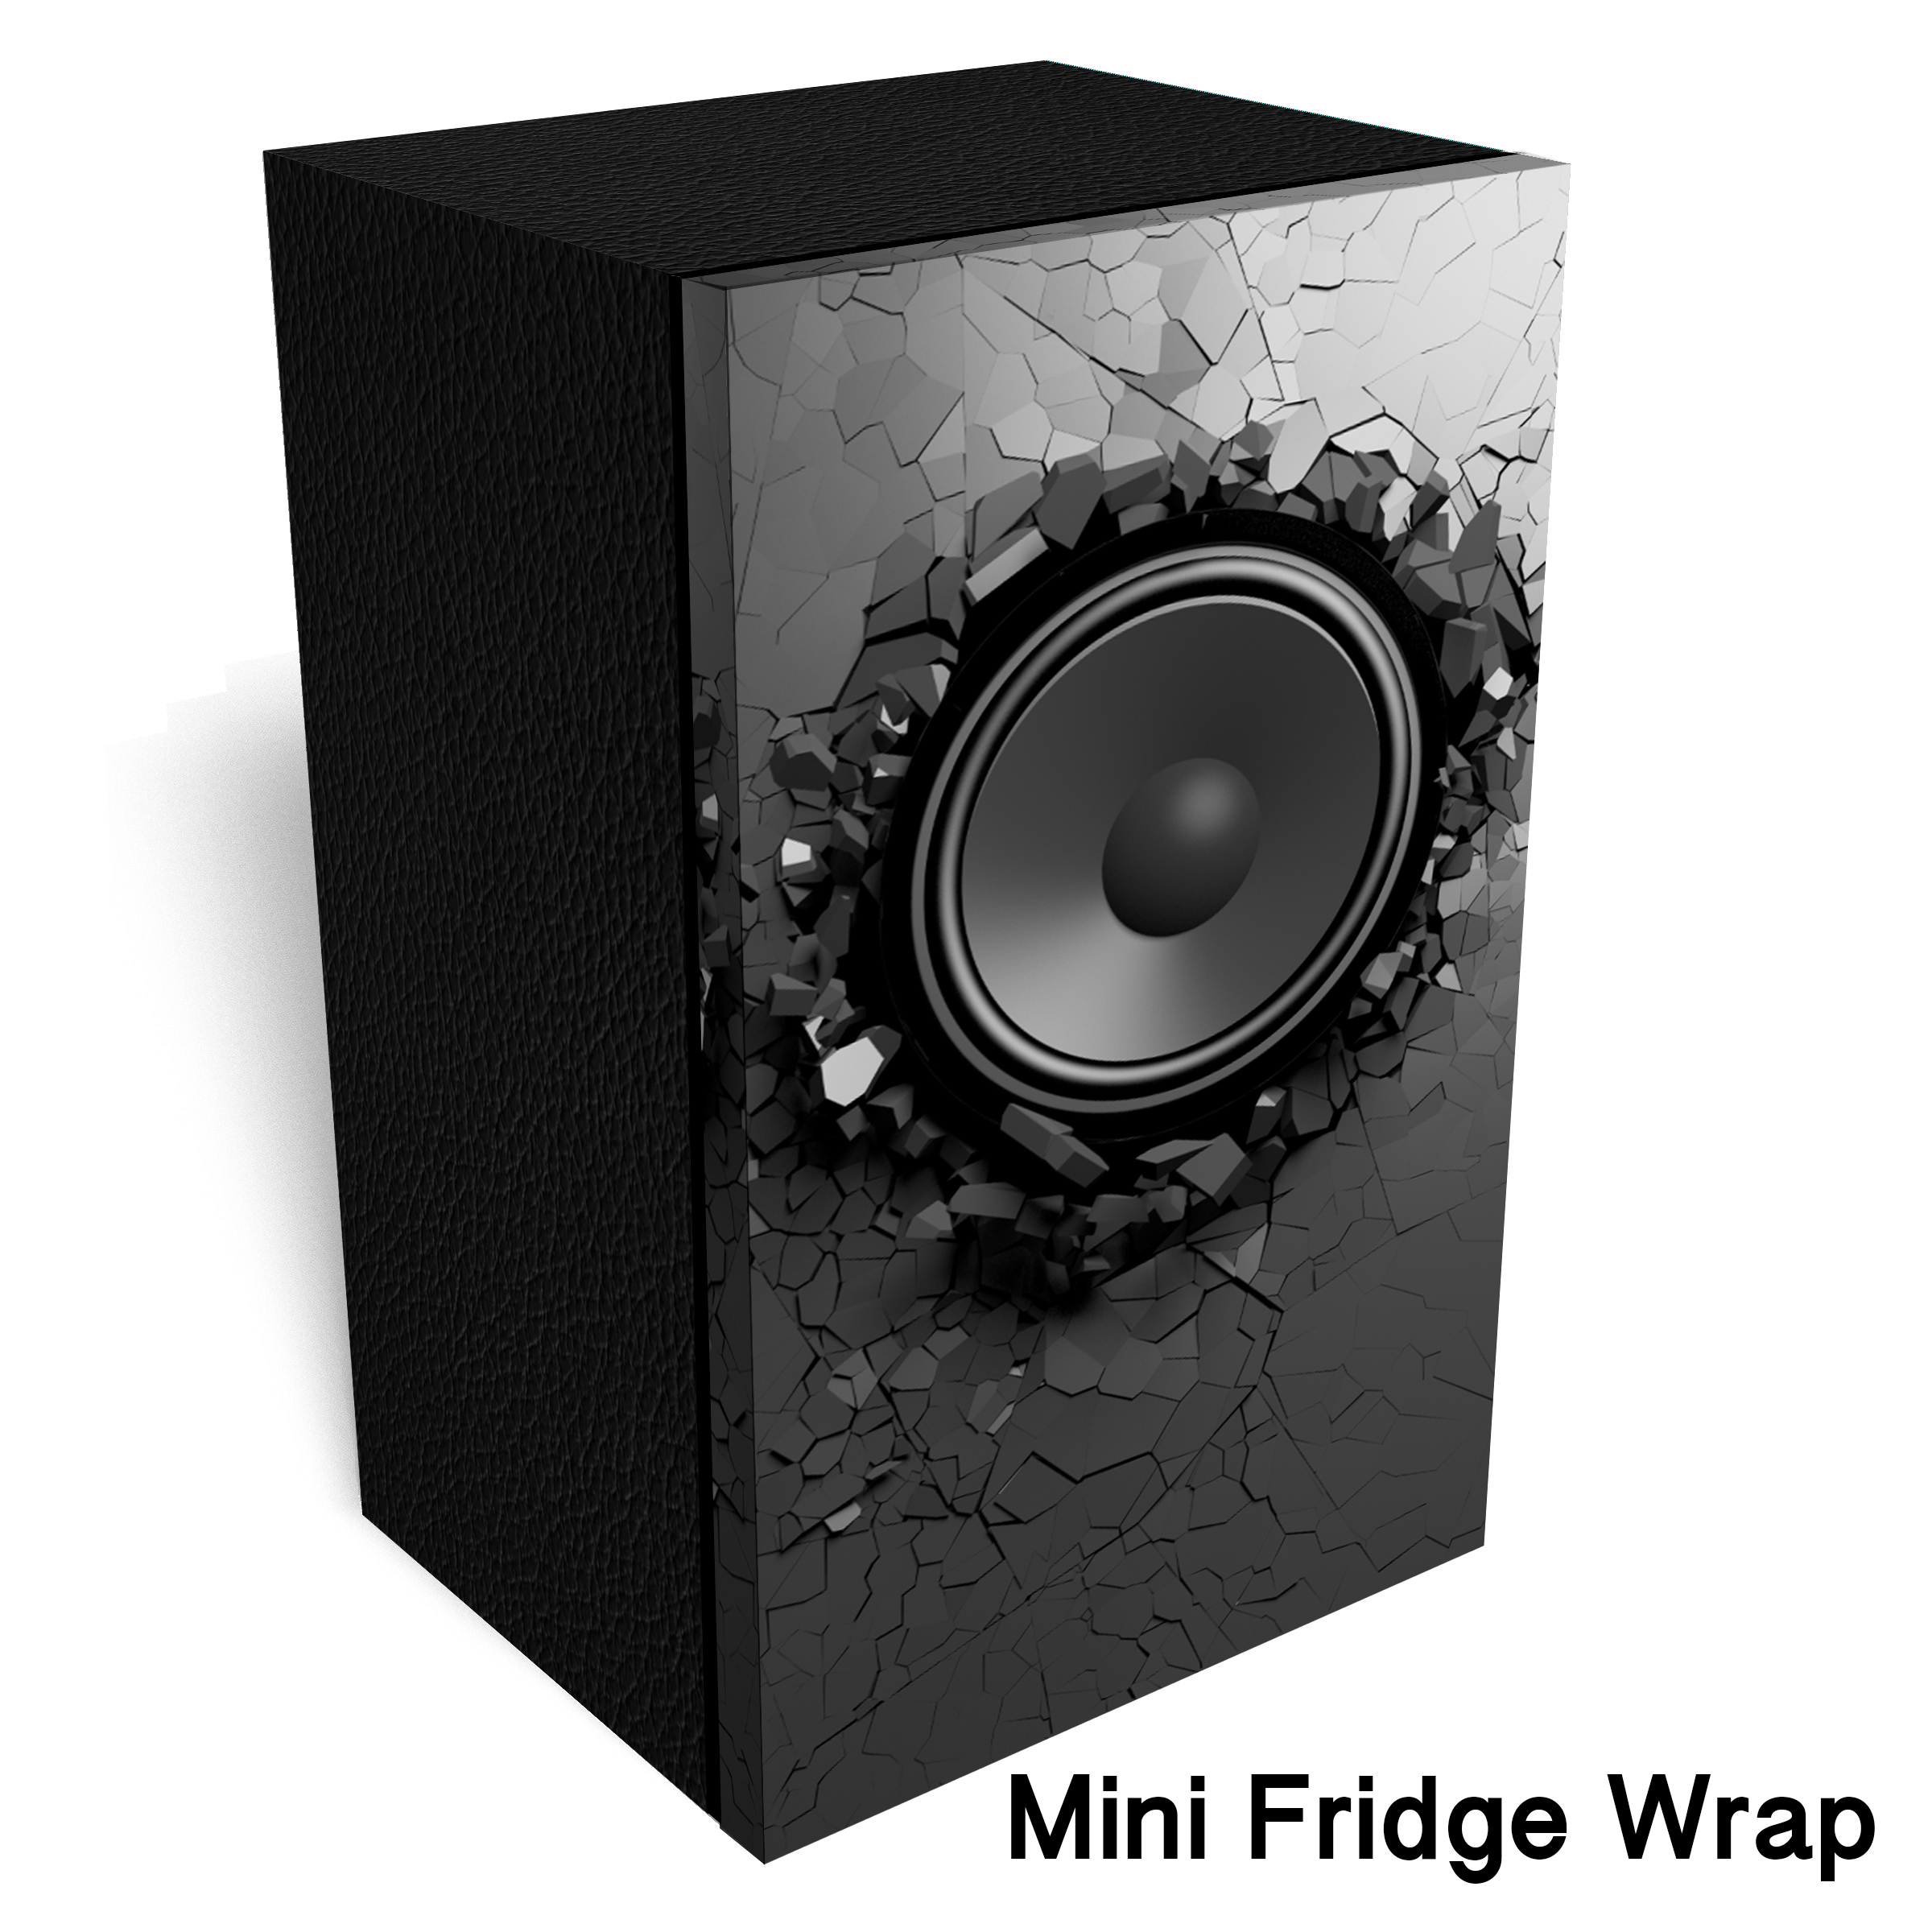 BOOM Box Loudspeaker Mini Fridge Wrap